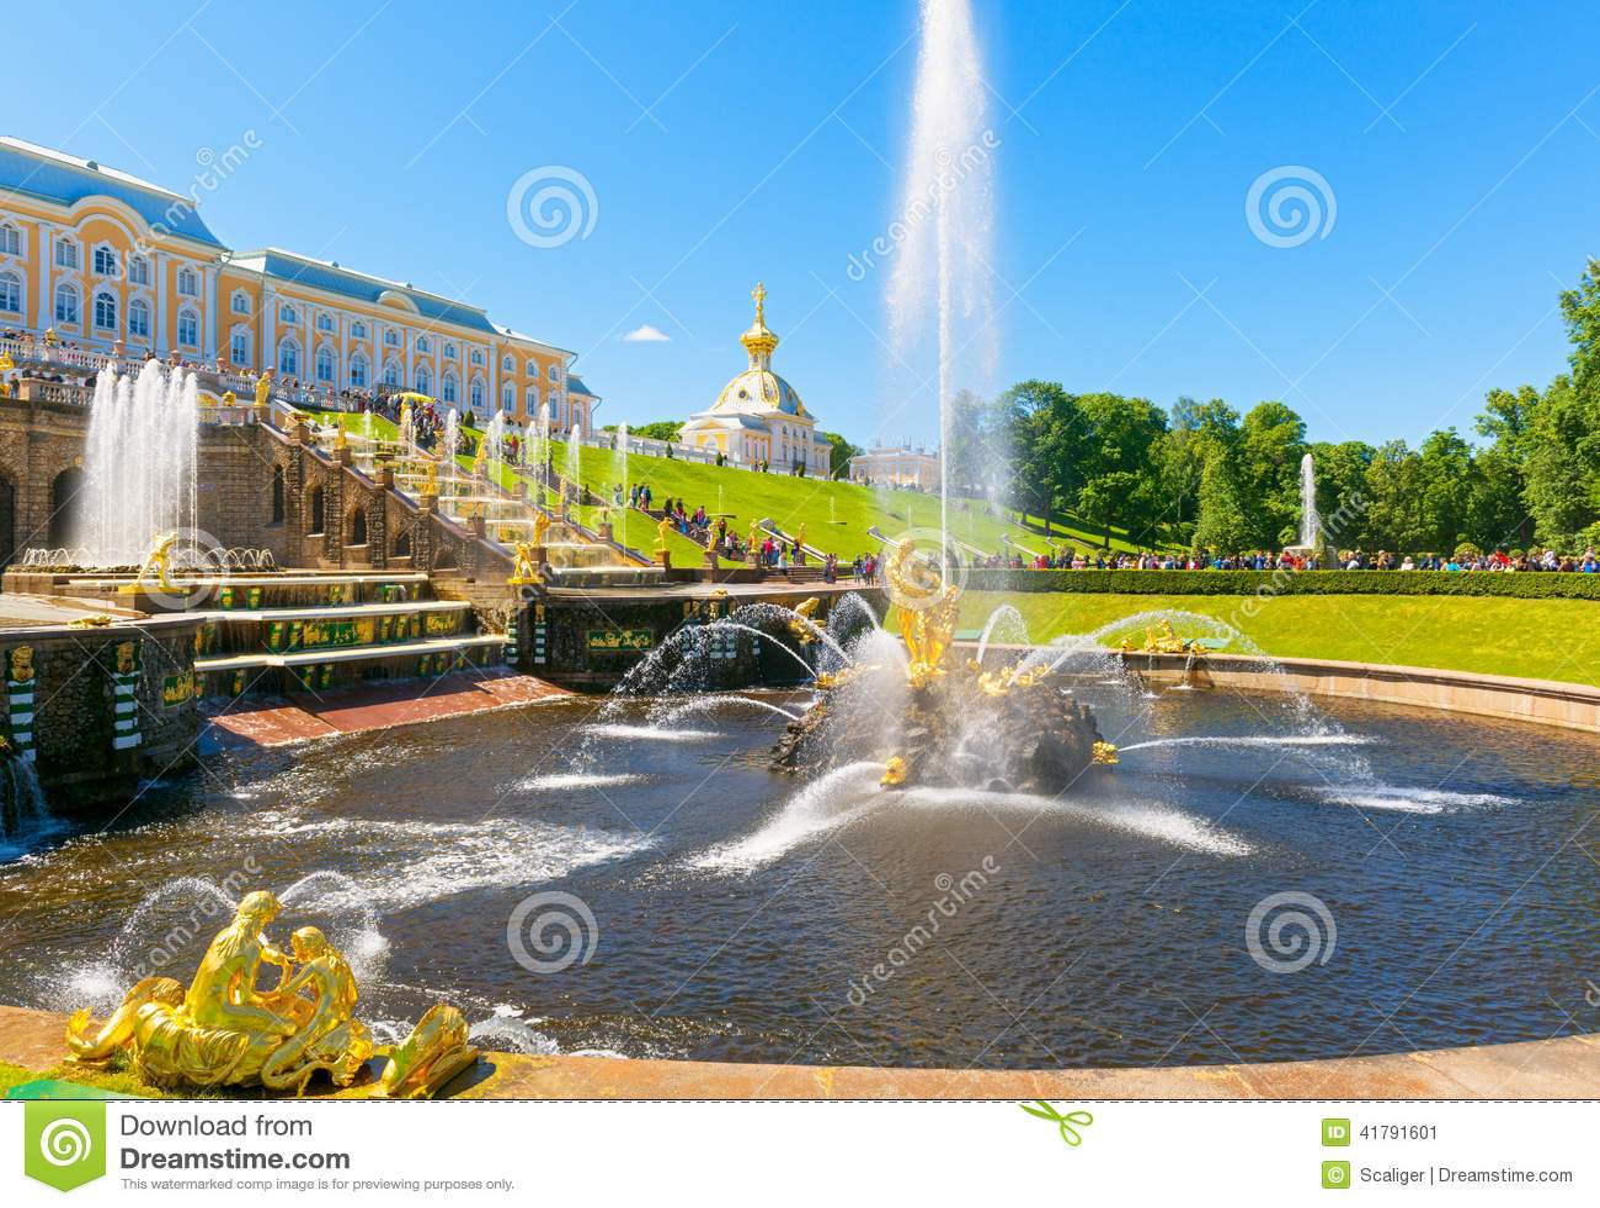 Cascata e Samson Fountain grandes no palácio de Perterhof, Pe de Saint